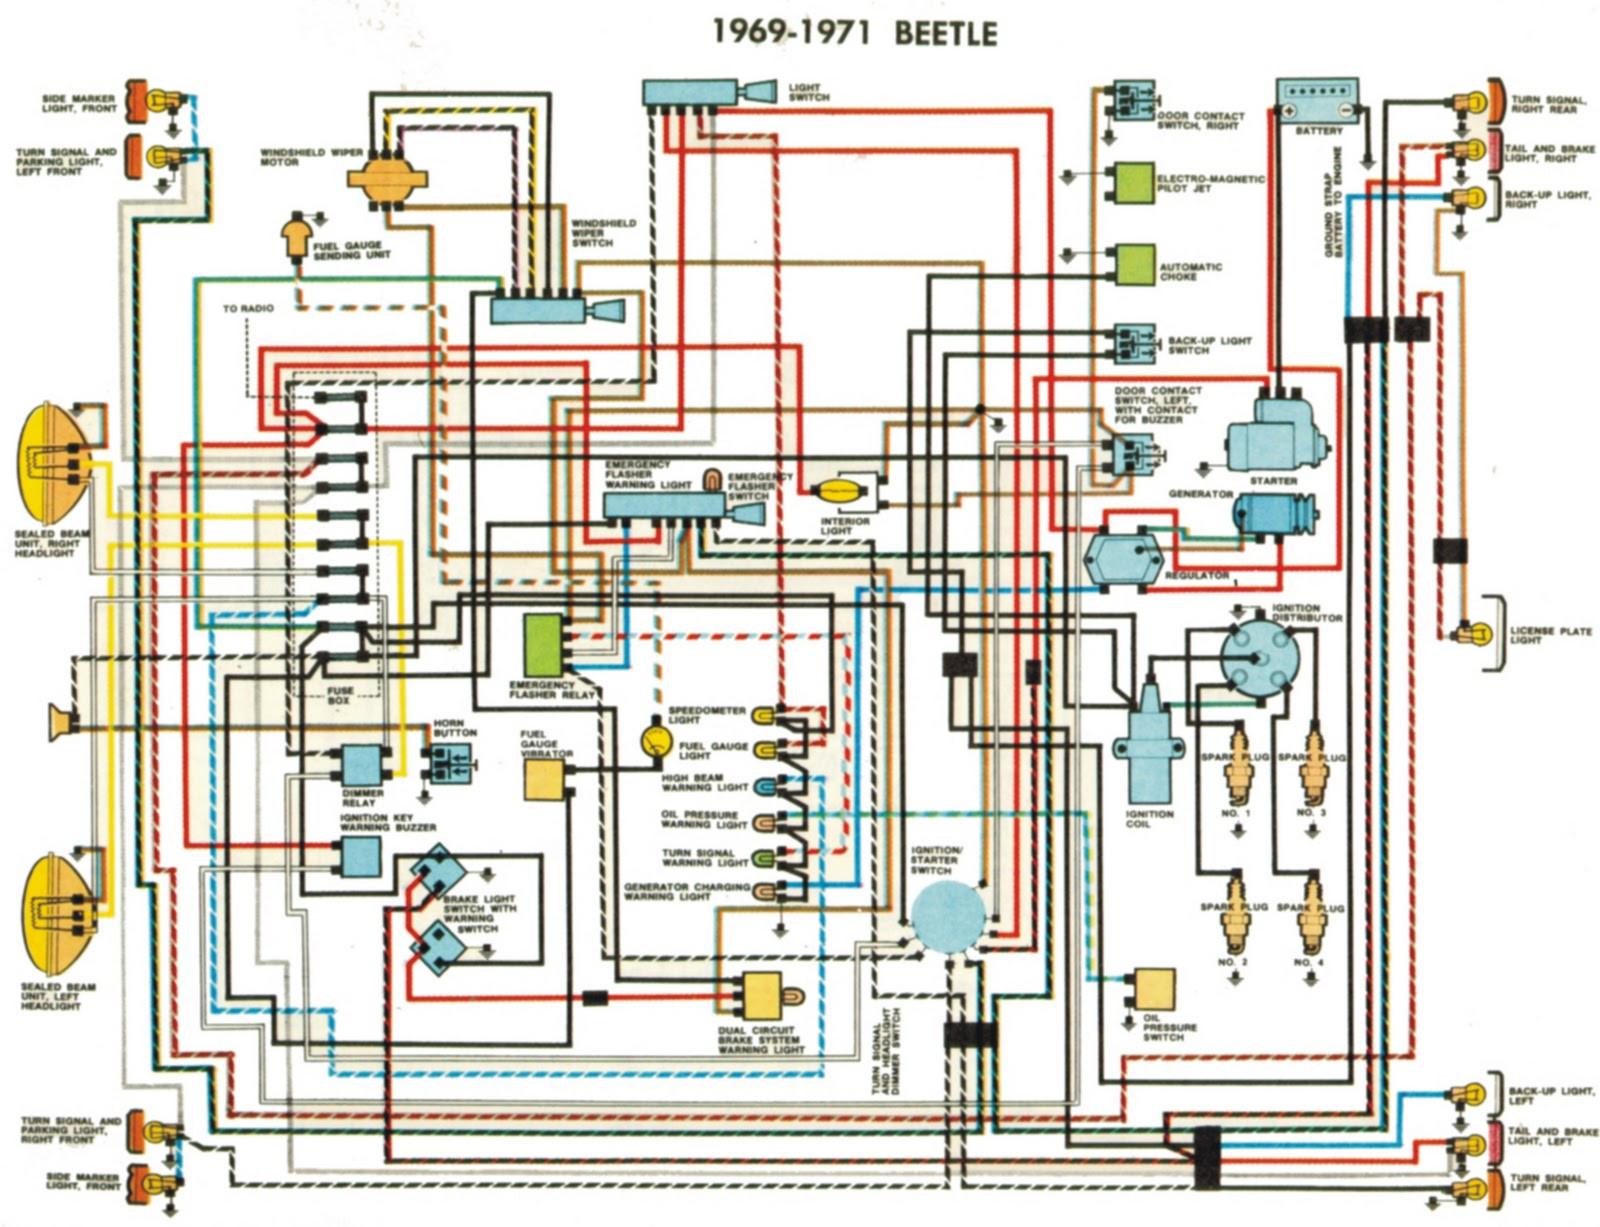 2000 Beetle Wiring Diagram Madcomics: Vw Beetle Wiring Diagram Light Of 2000 Beetle Wiring Diagram